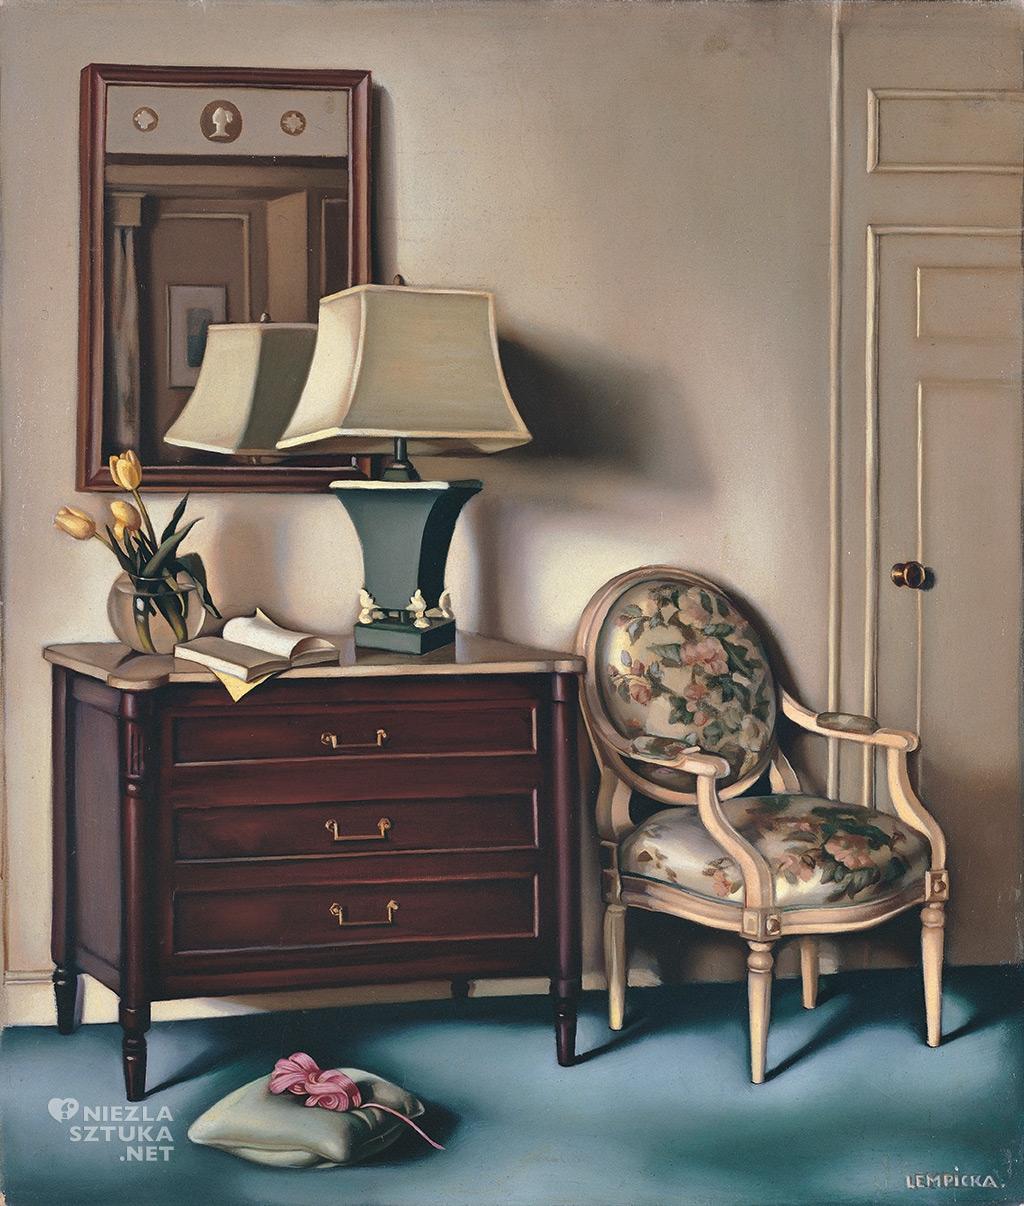 Tamara Łempicka, Chambre d'hotel | 1951 Privet collection © Tamara Art Heritage. Licensed by MMI NYC ADAGP Paris SIAE Roma 2015